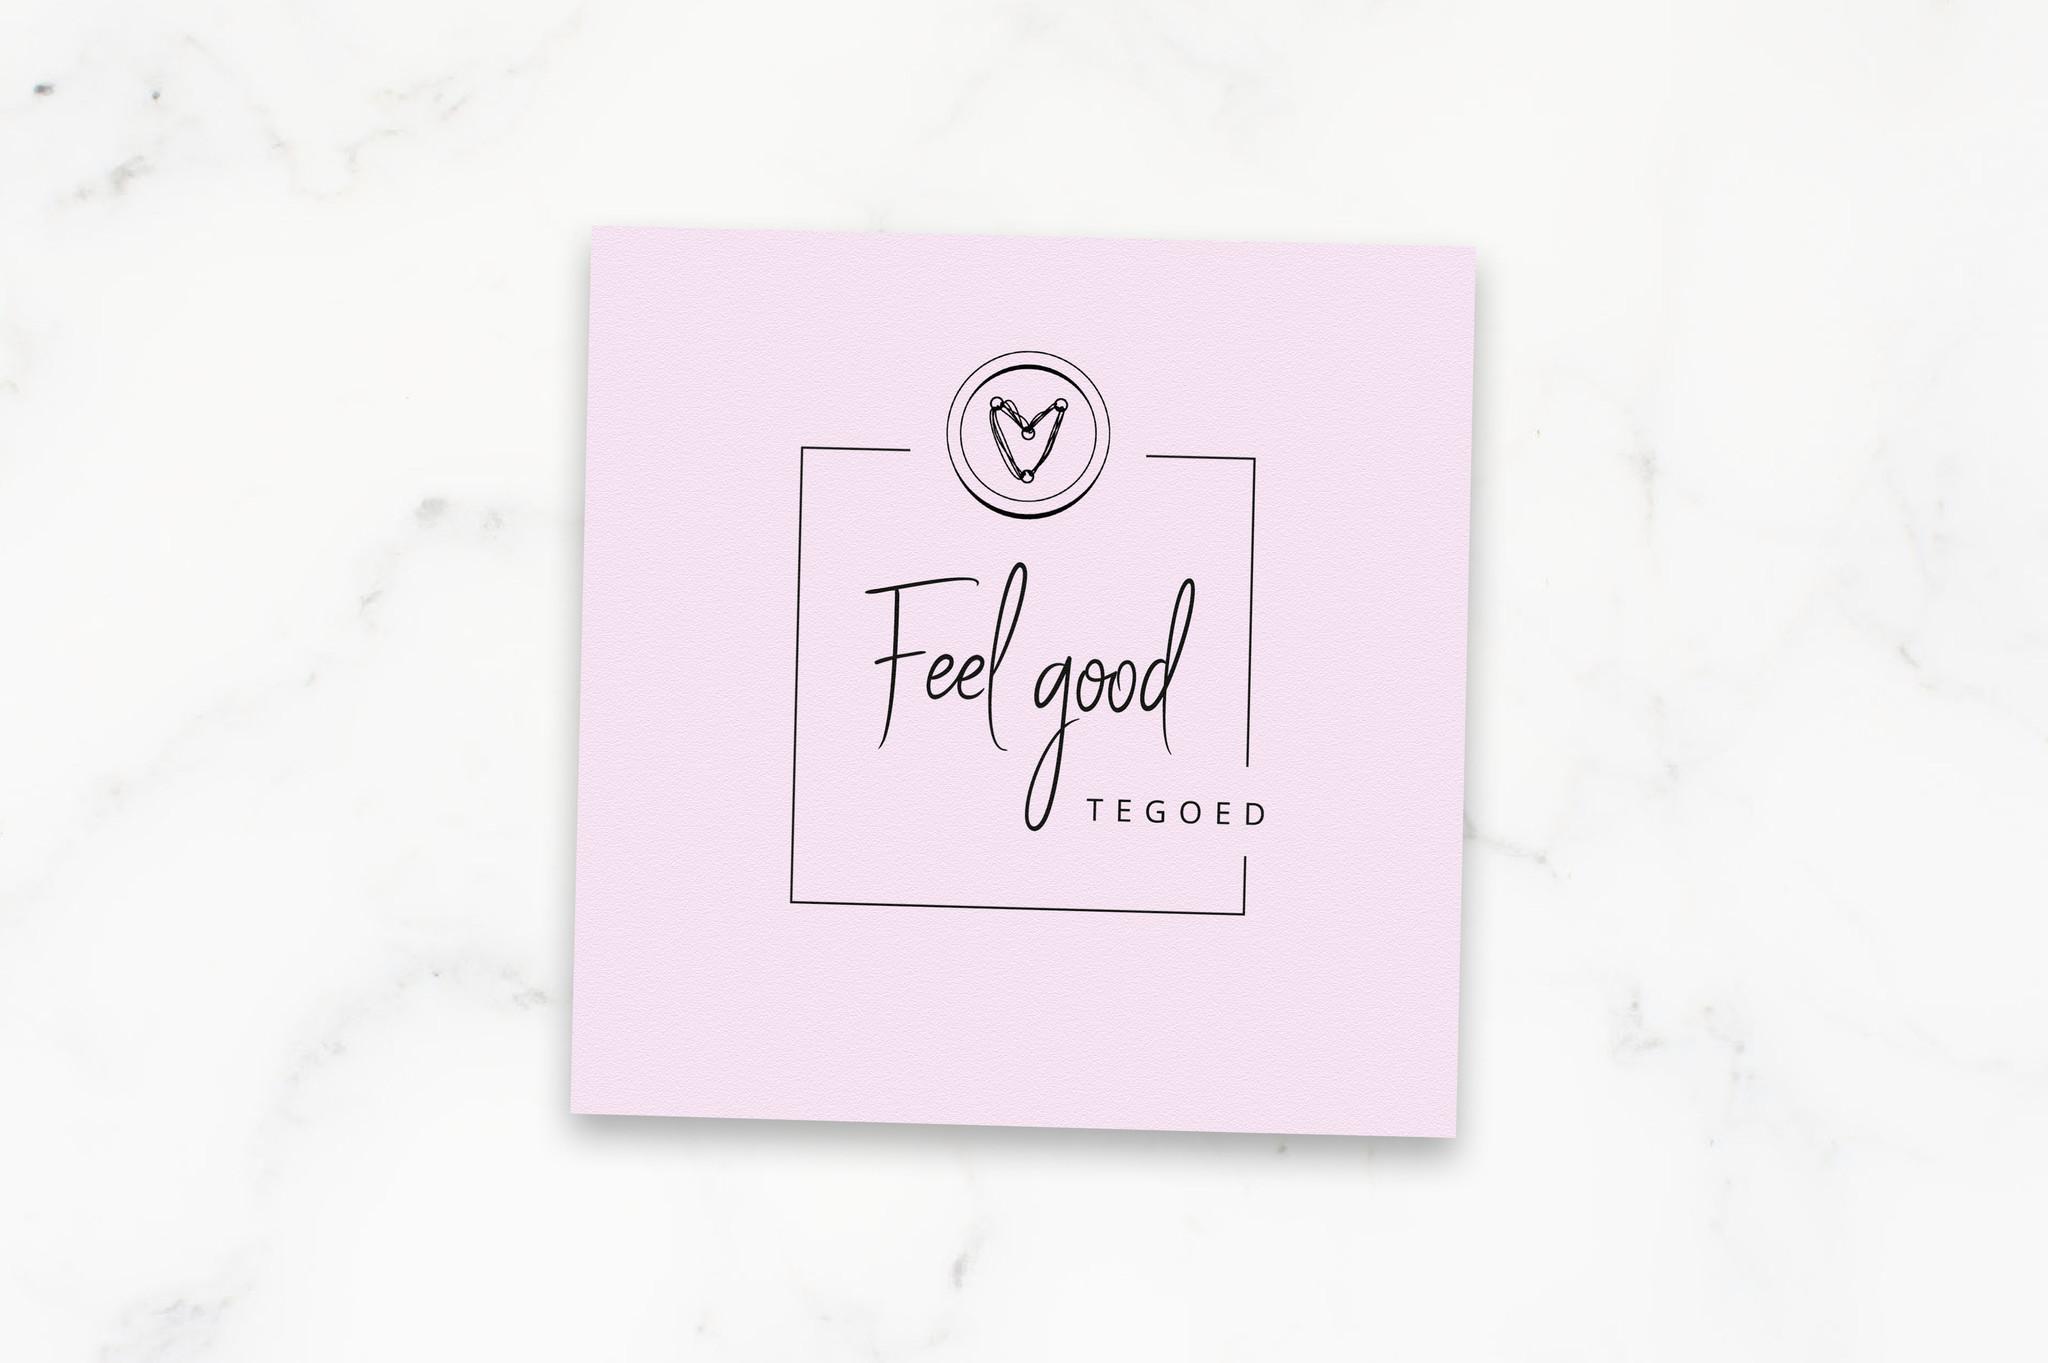 Feel Good Tegoed 'in je mailbox' 25 euro